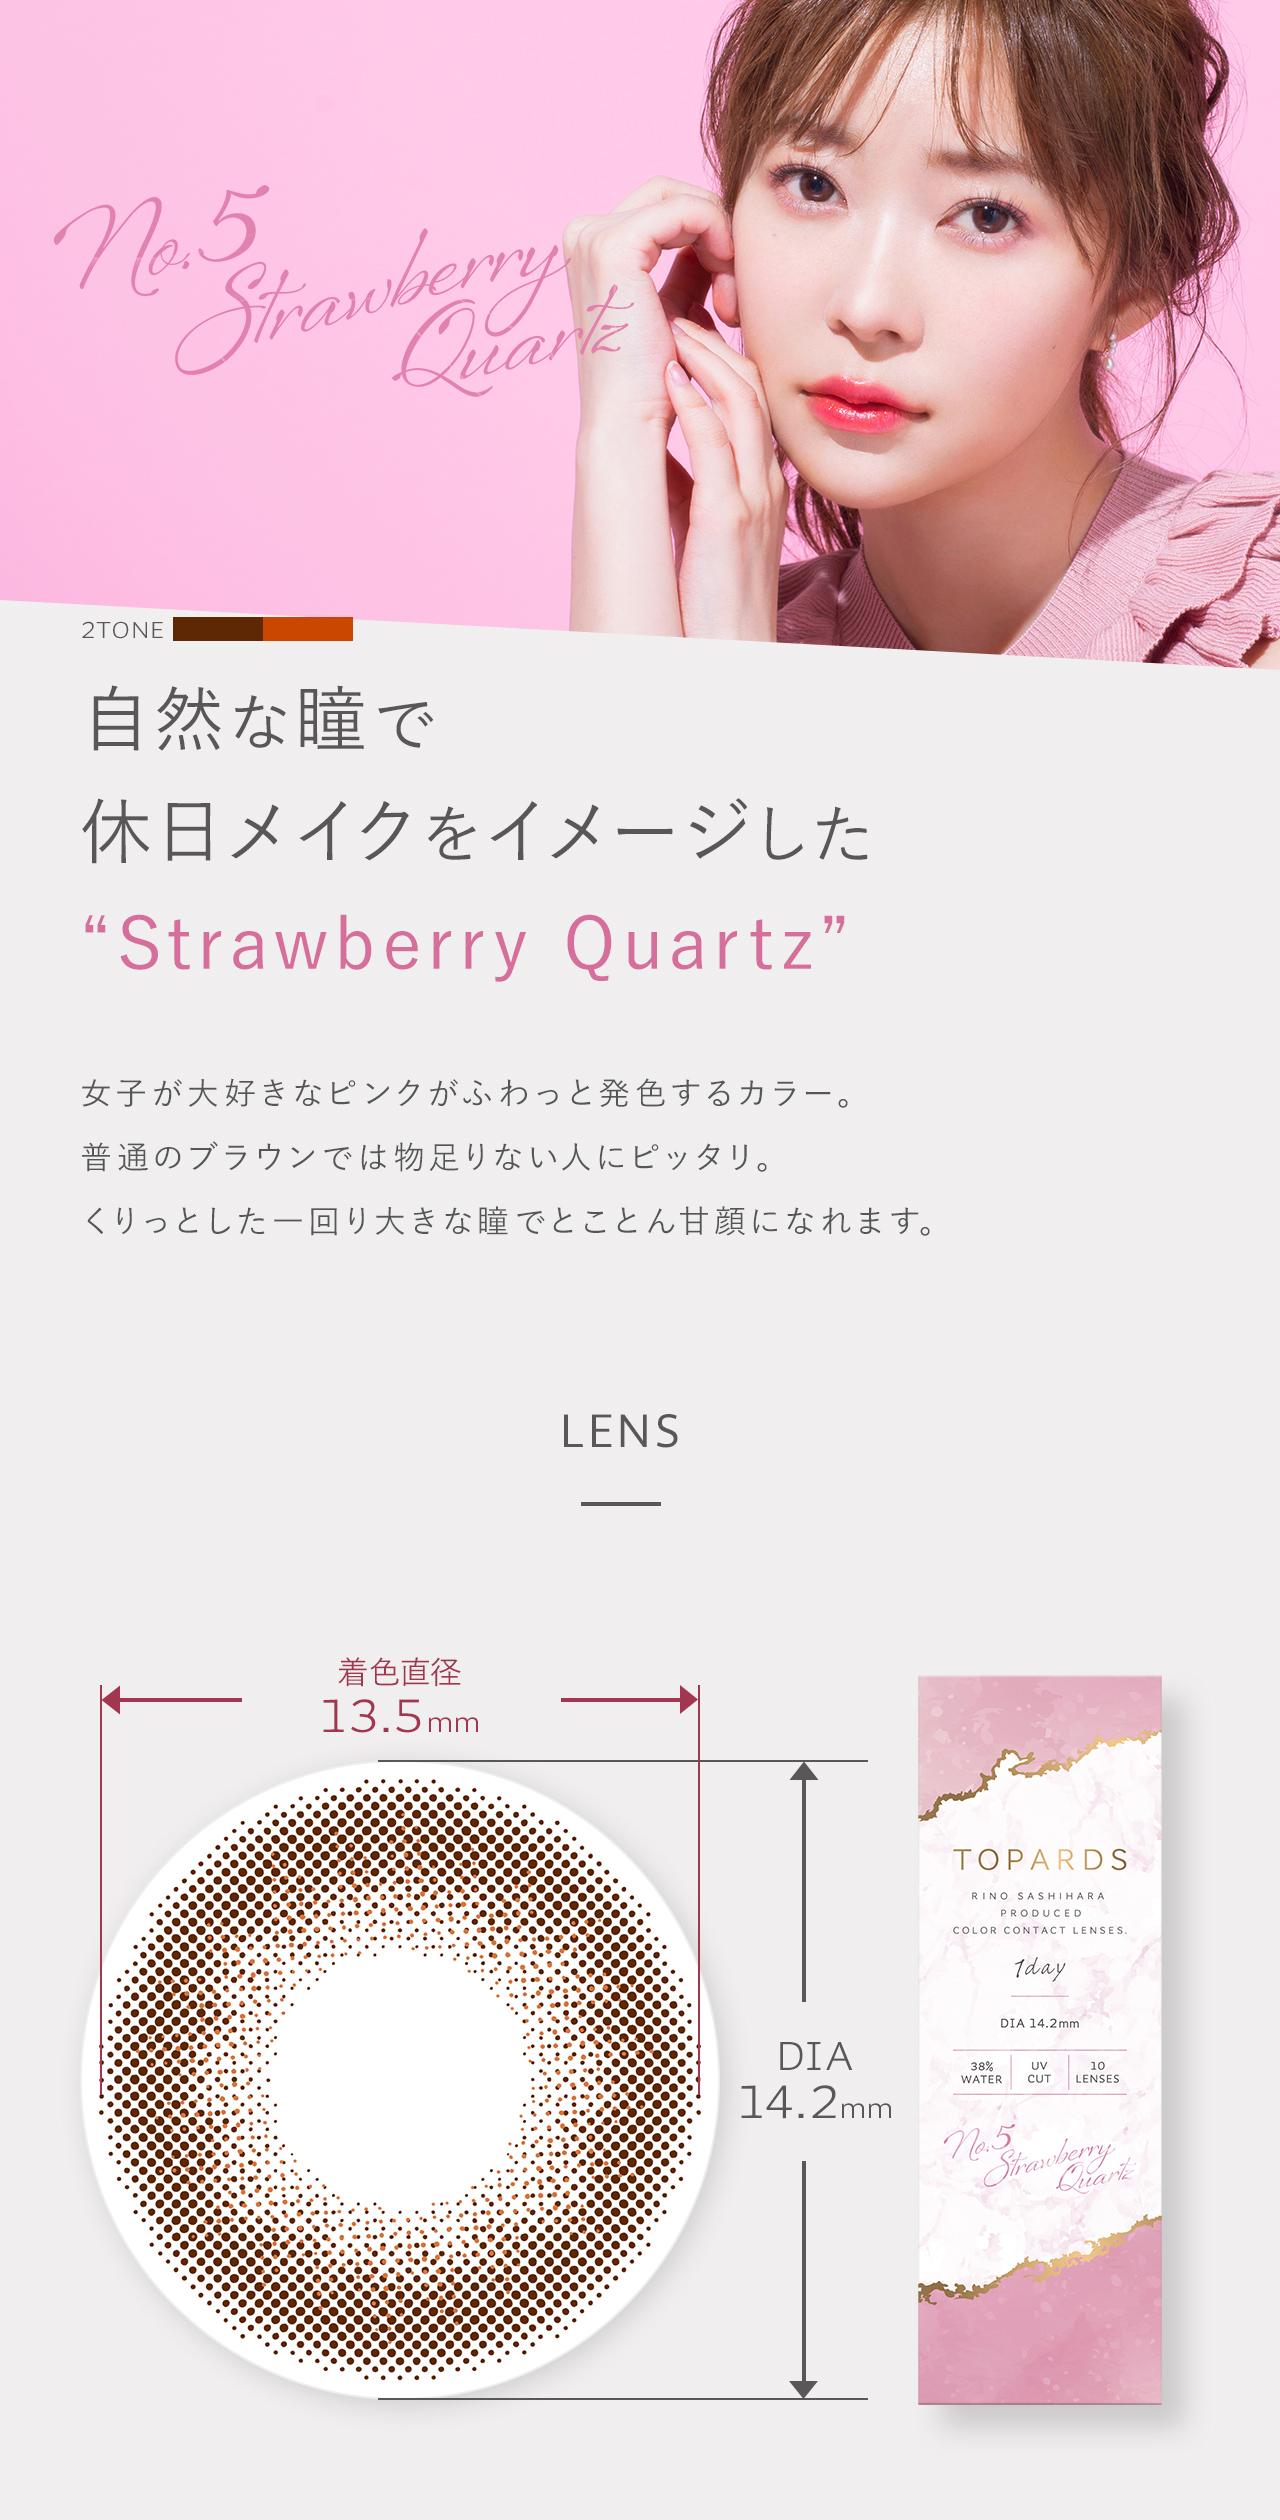 Strawberry Quartz ストロベリークォーツ